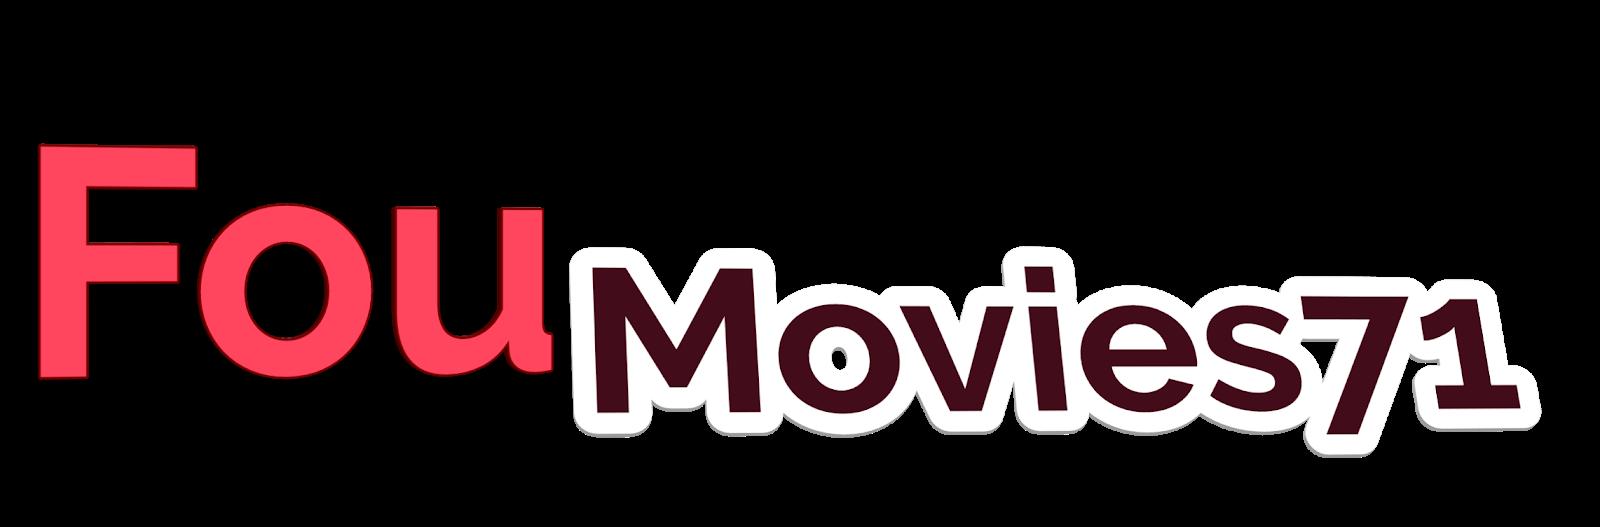 raid hd movie download fou movies